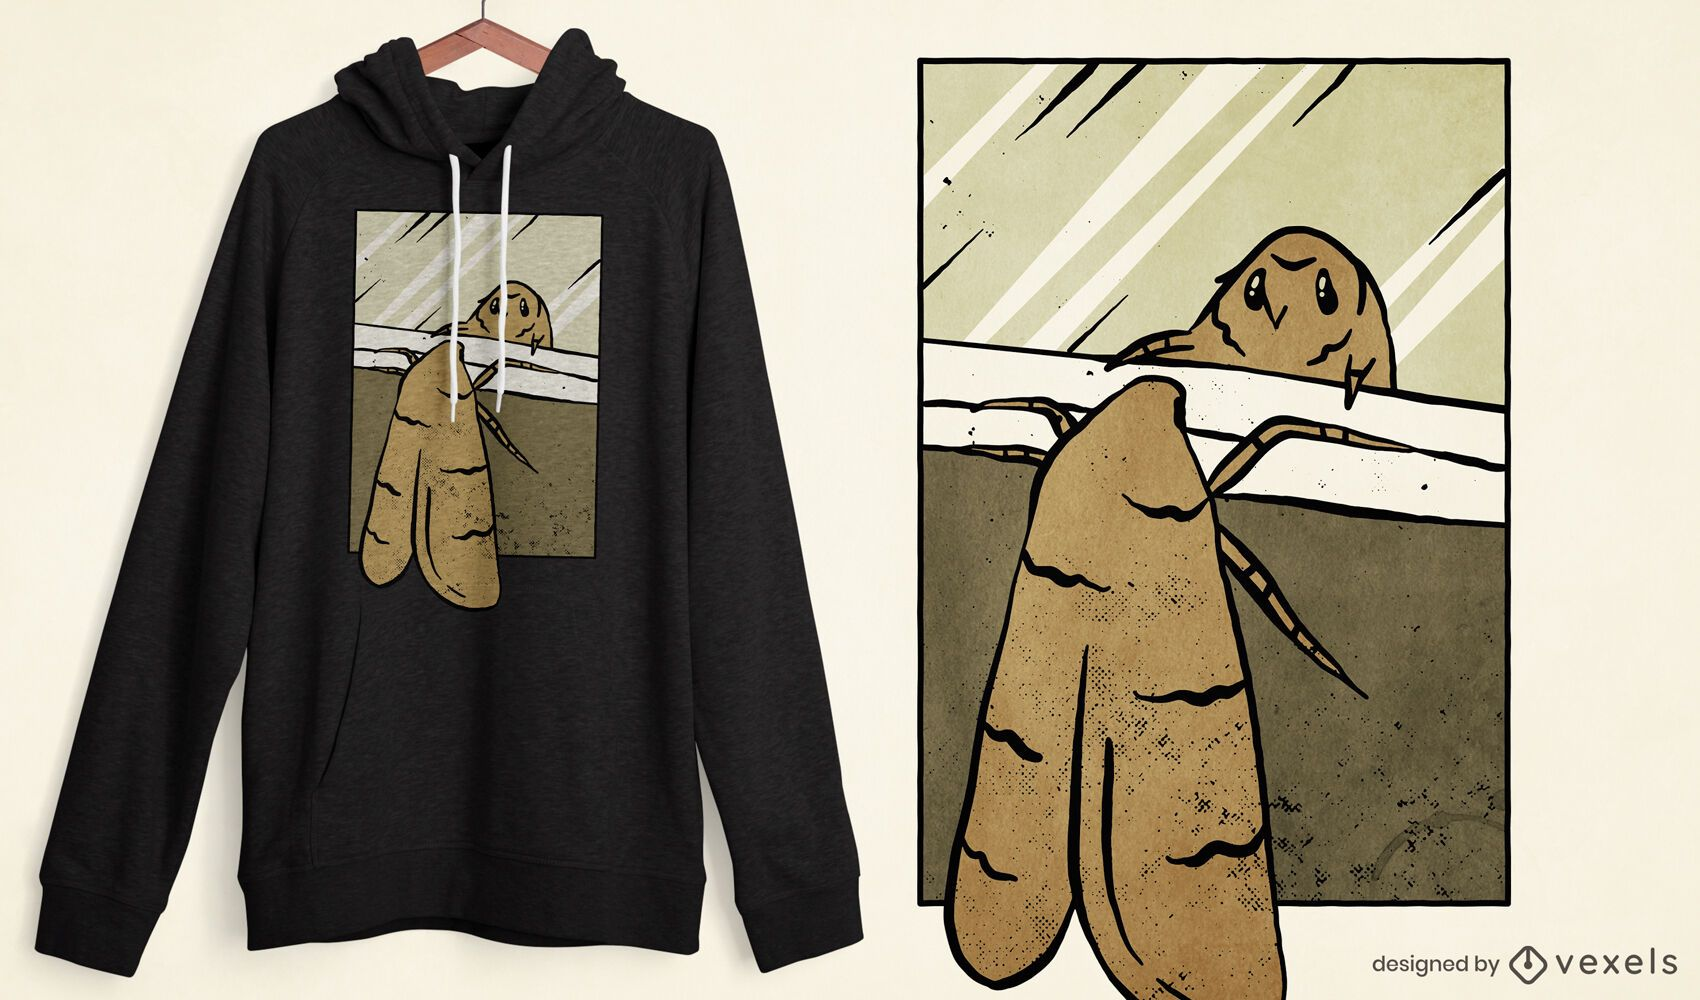 Mirror moth meme t-shirt design